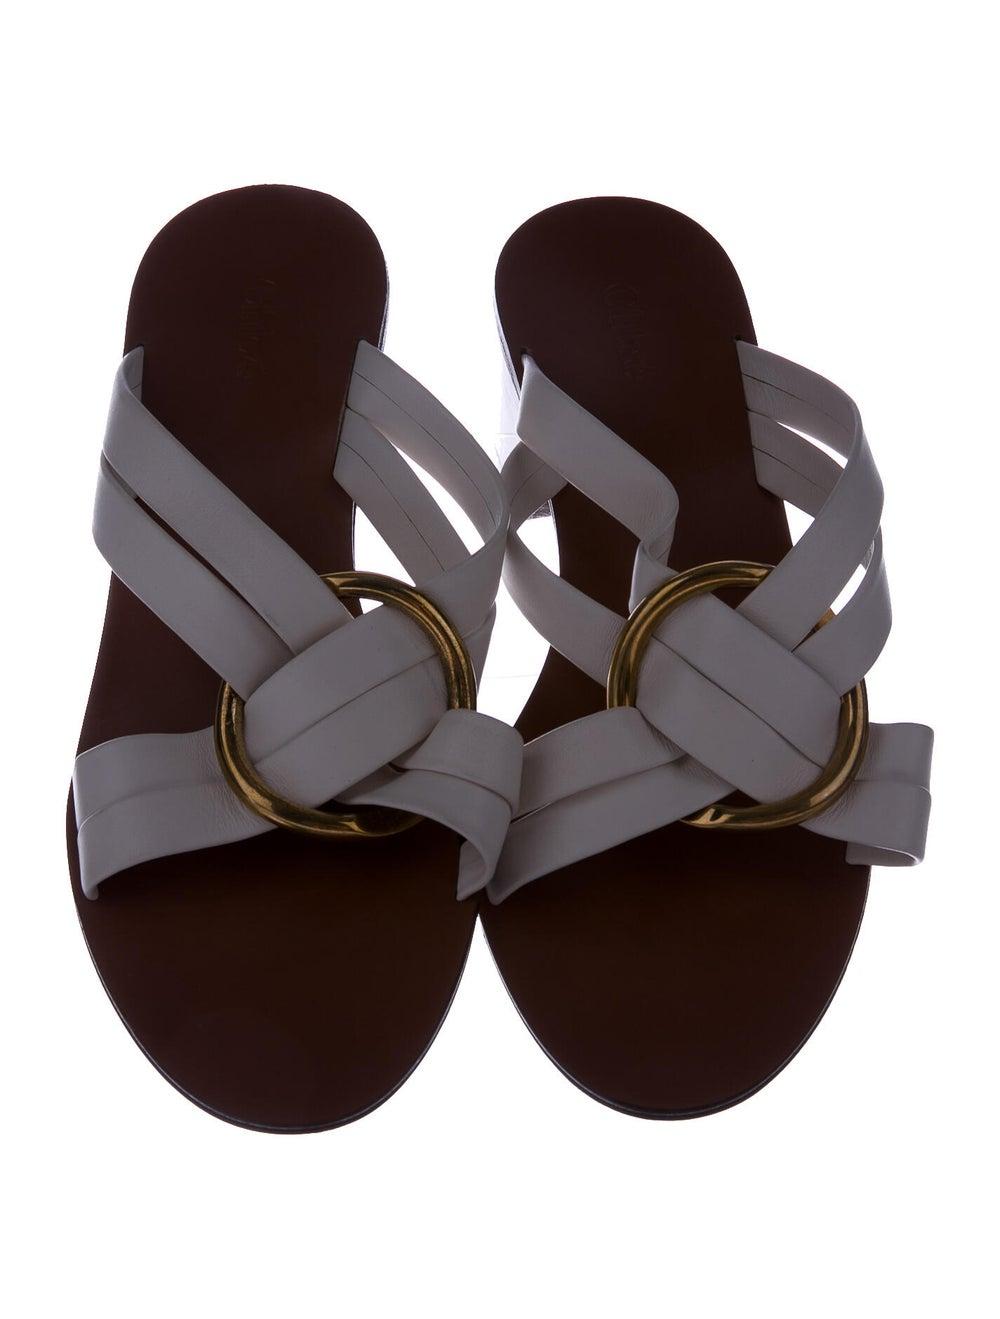 Chloé Leather Slides - image 3